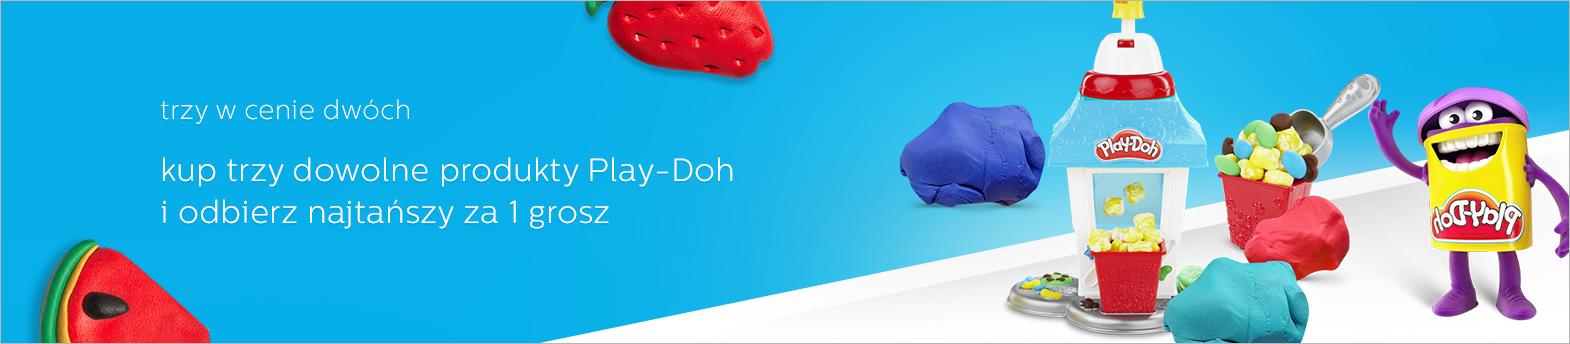 promocja play-doh